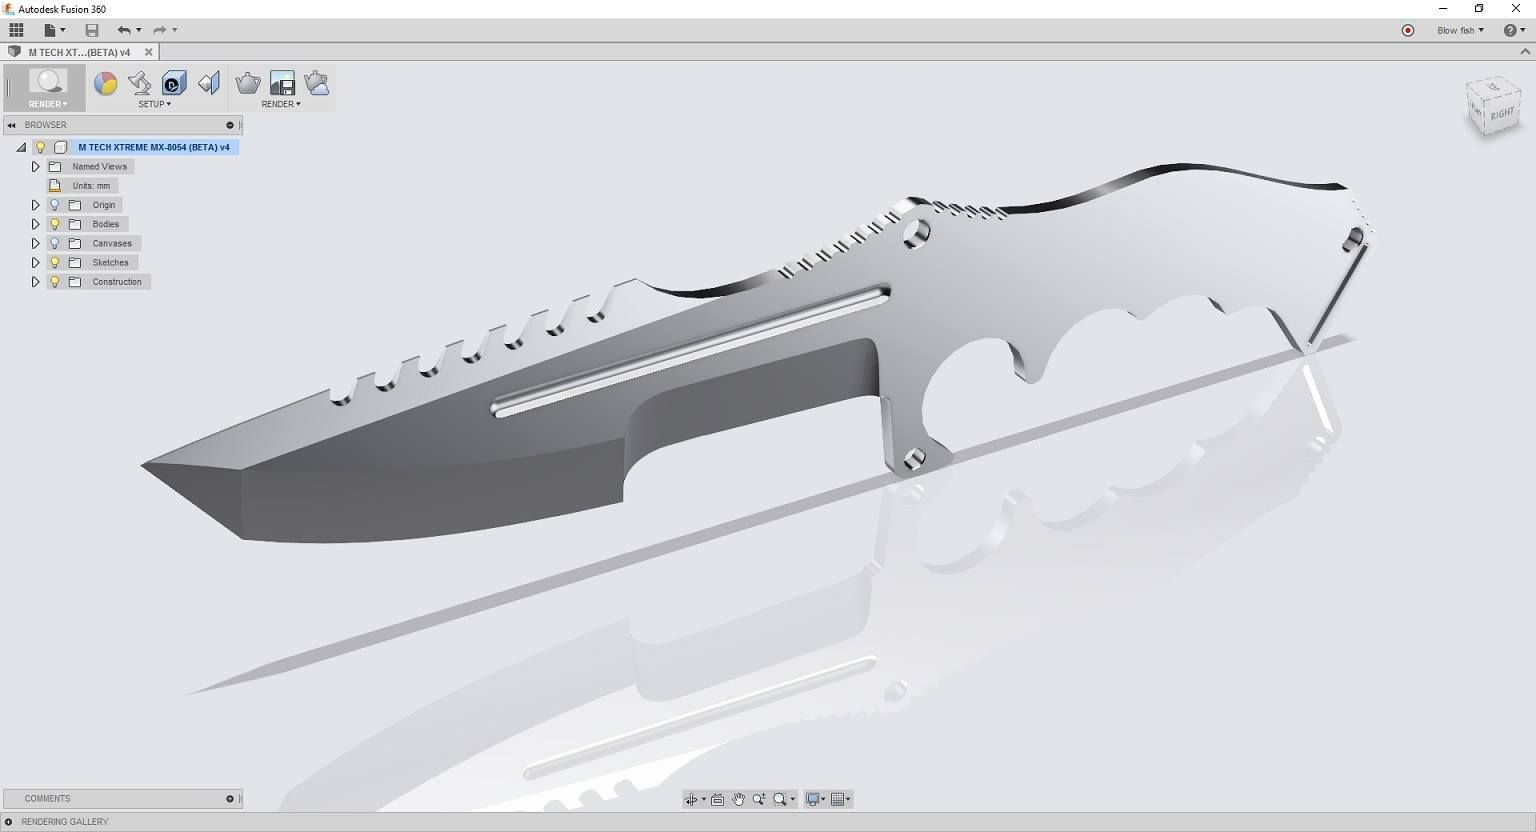 Blade-3500-3500